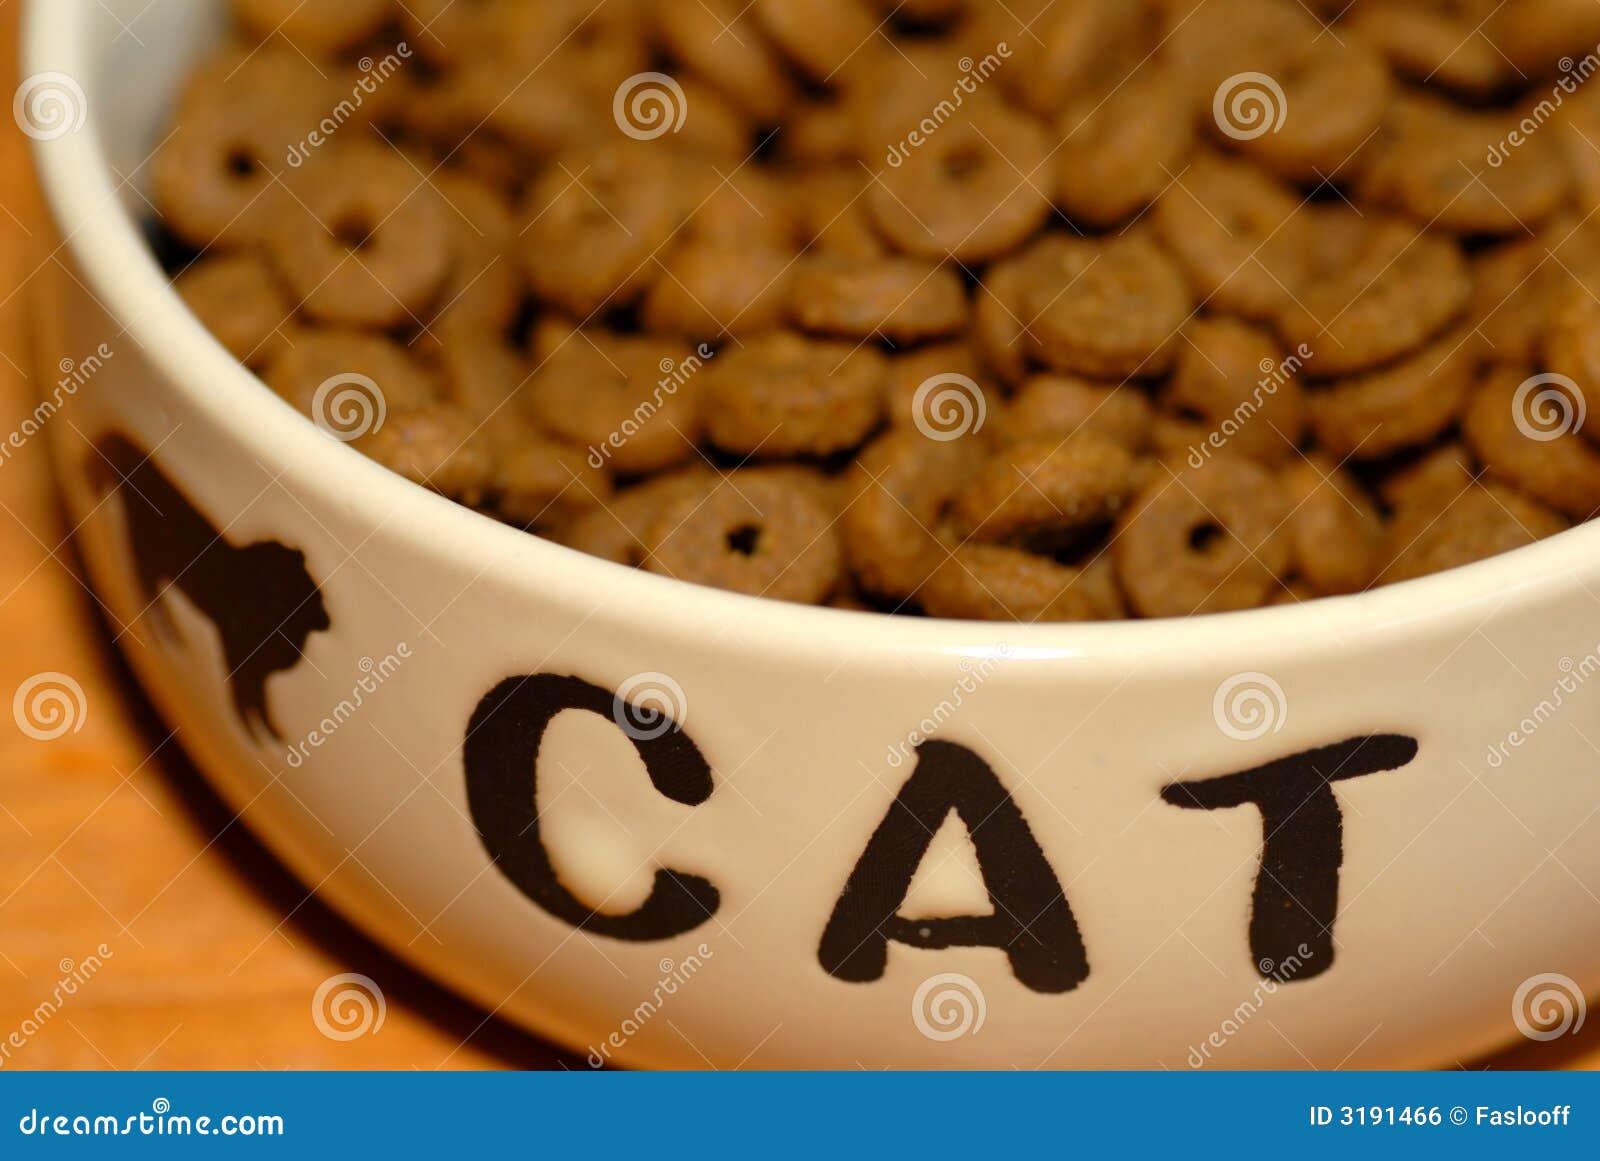 Aliment pour animaux familiers